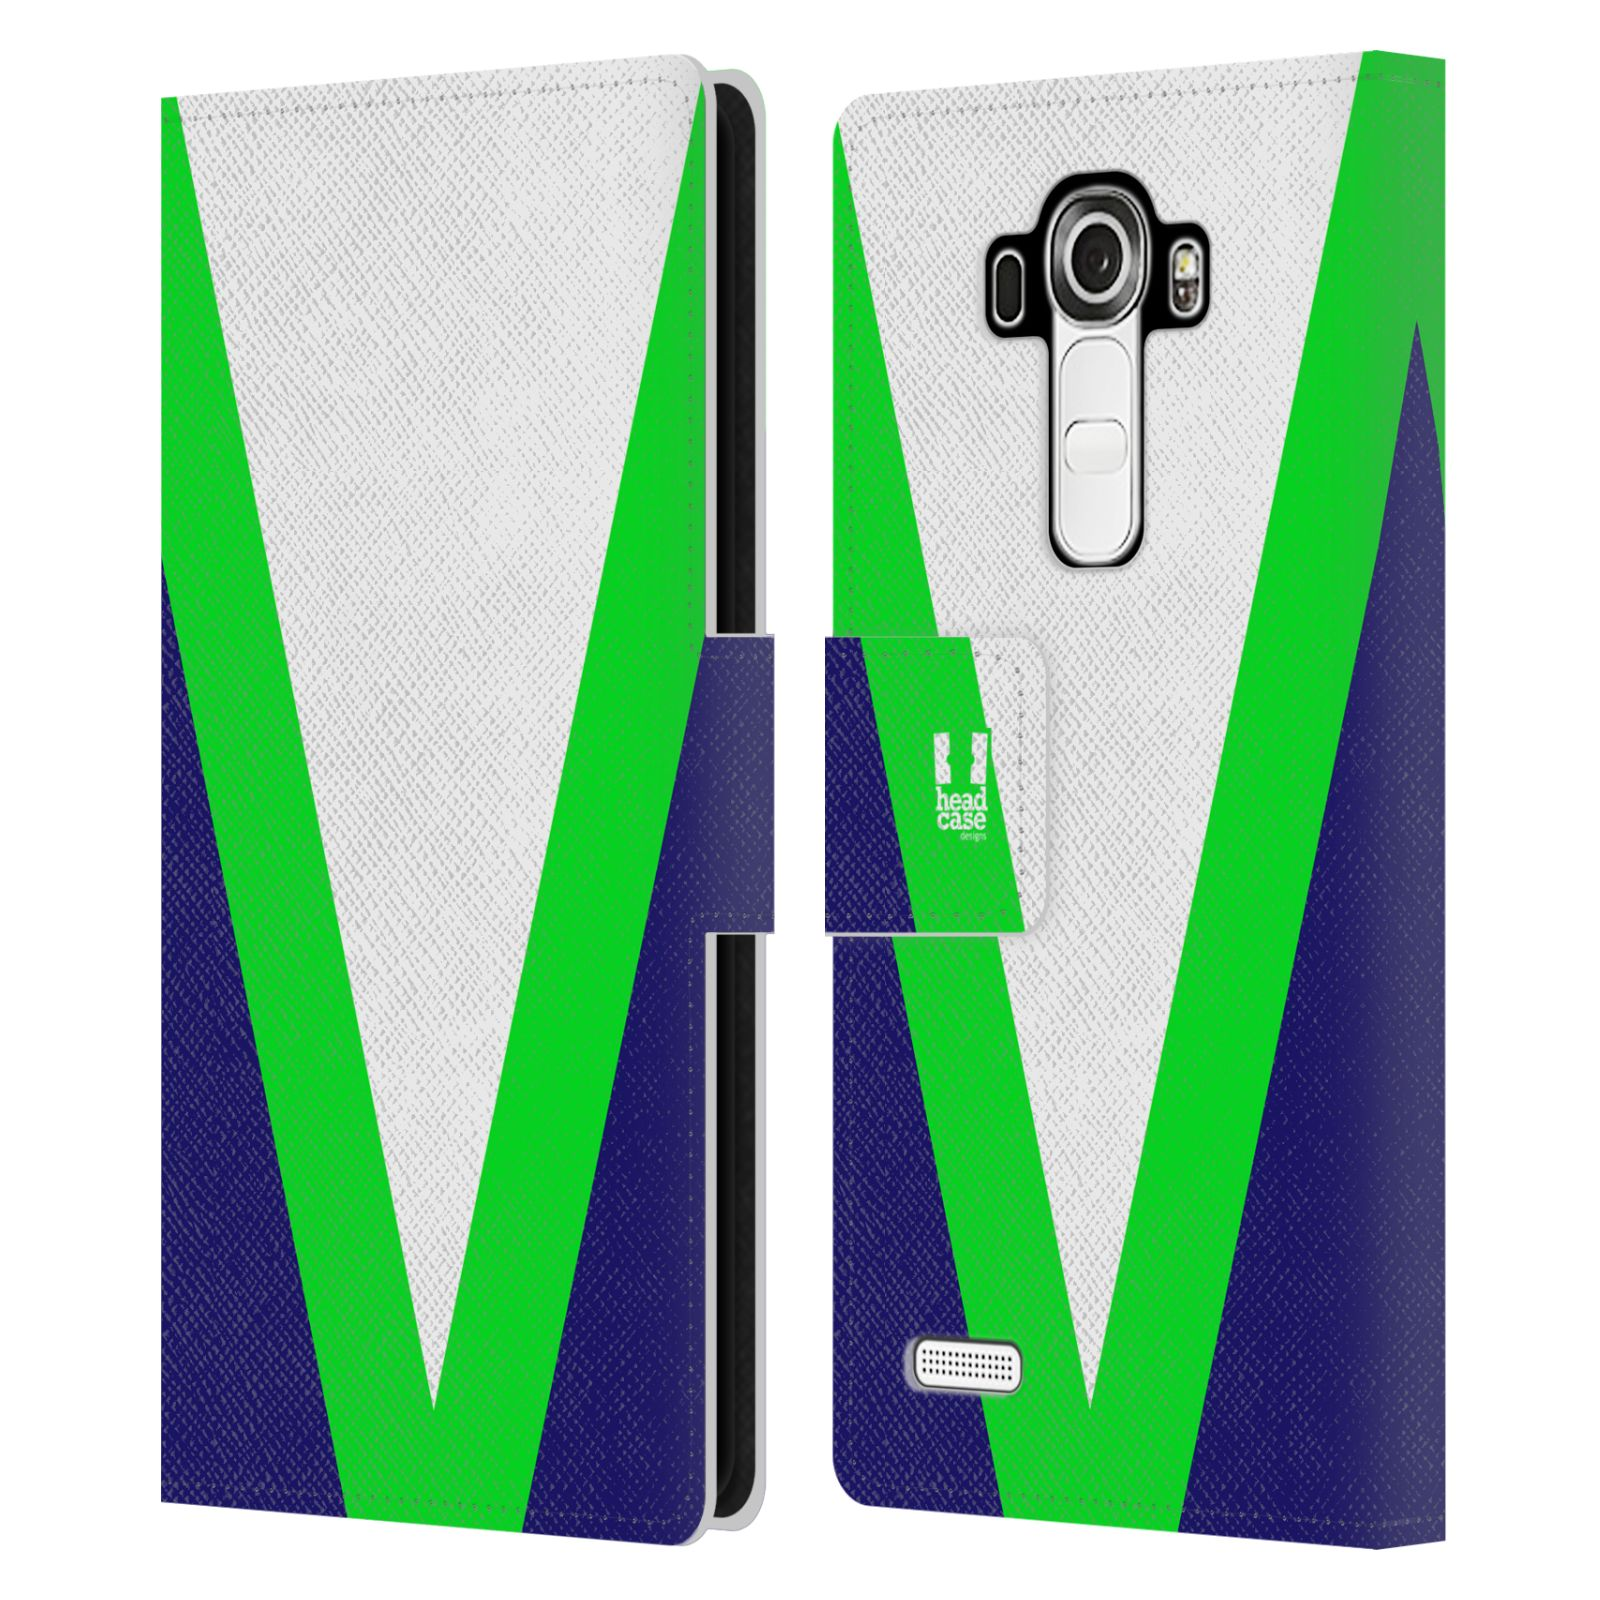 HEAD CASE Flipové pouzdro pro mobil LG G4 barevné tvary zelená a modrá